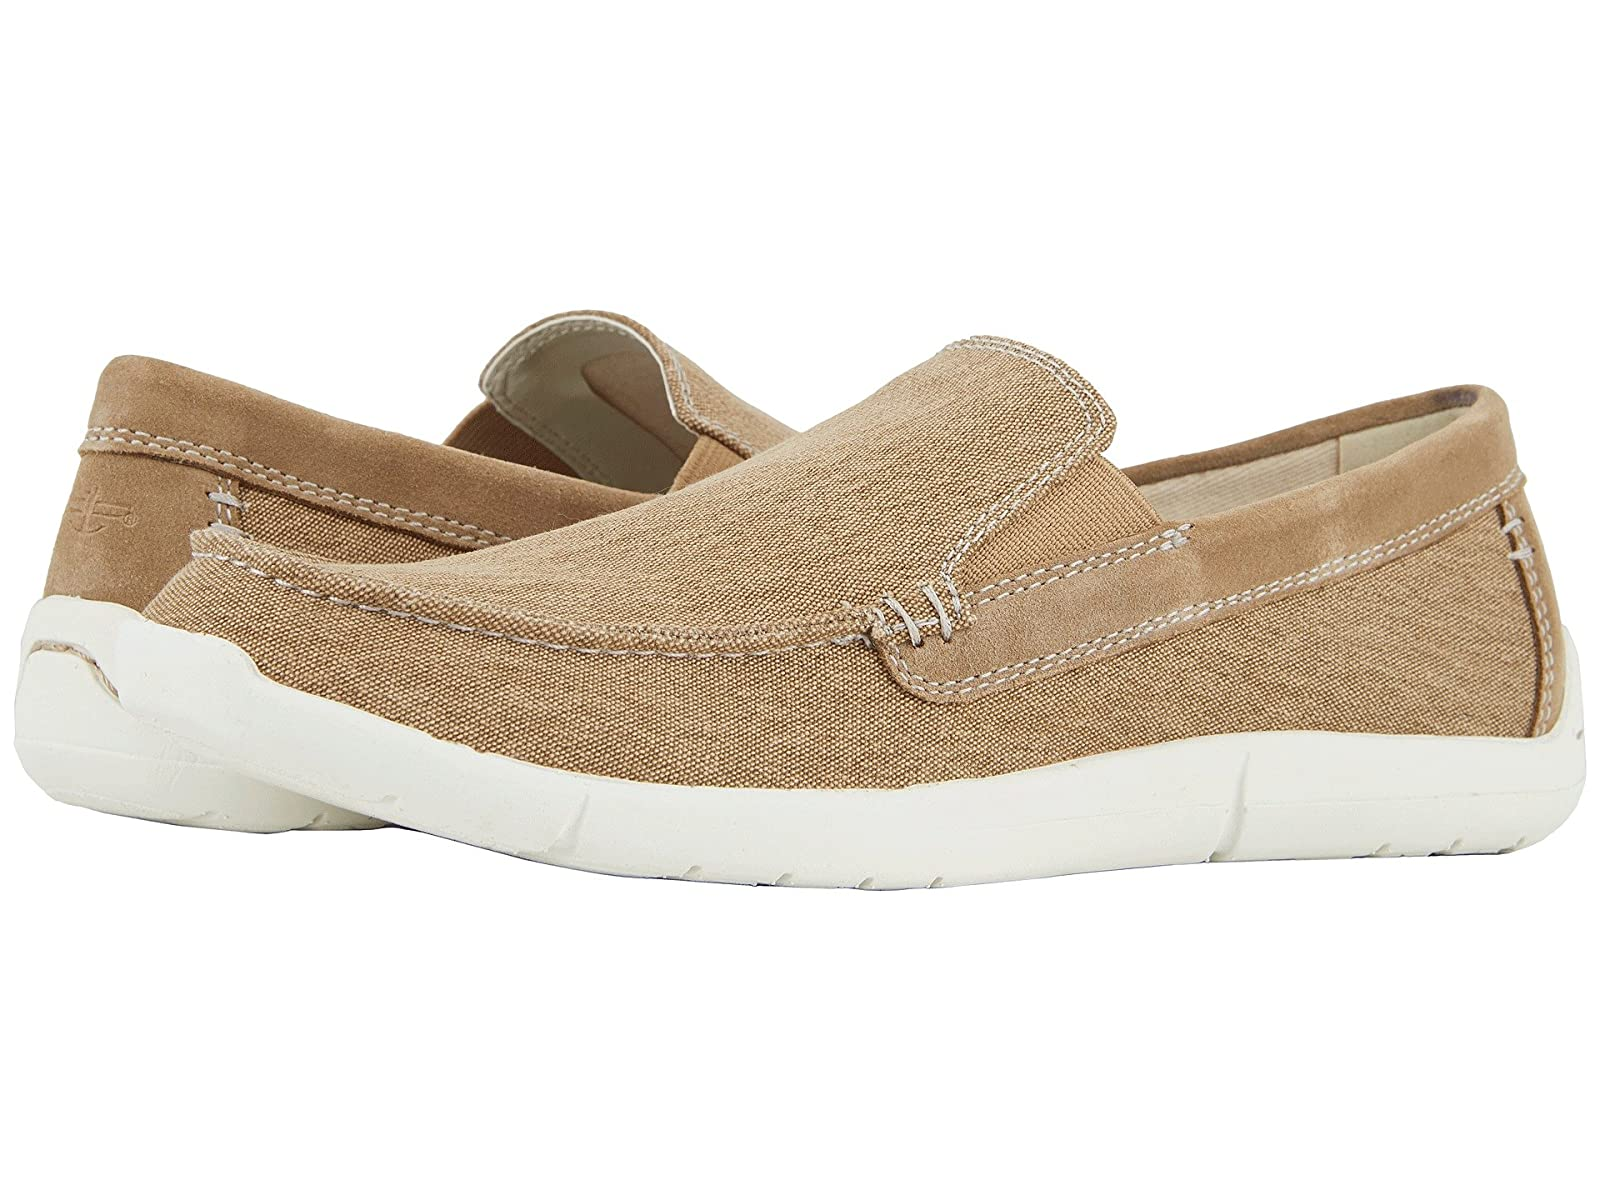 Dockers Ashland 360 Moc Toe LoaferAtmospheric grades have affordable shoes